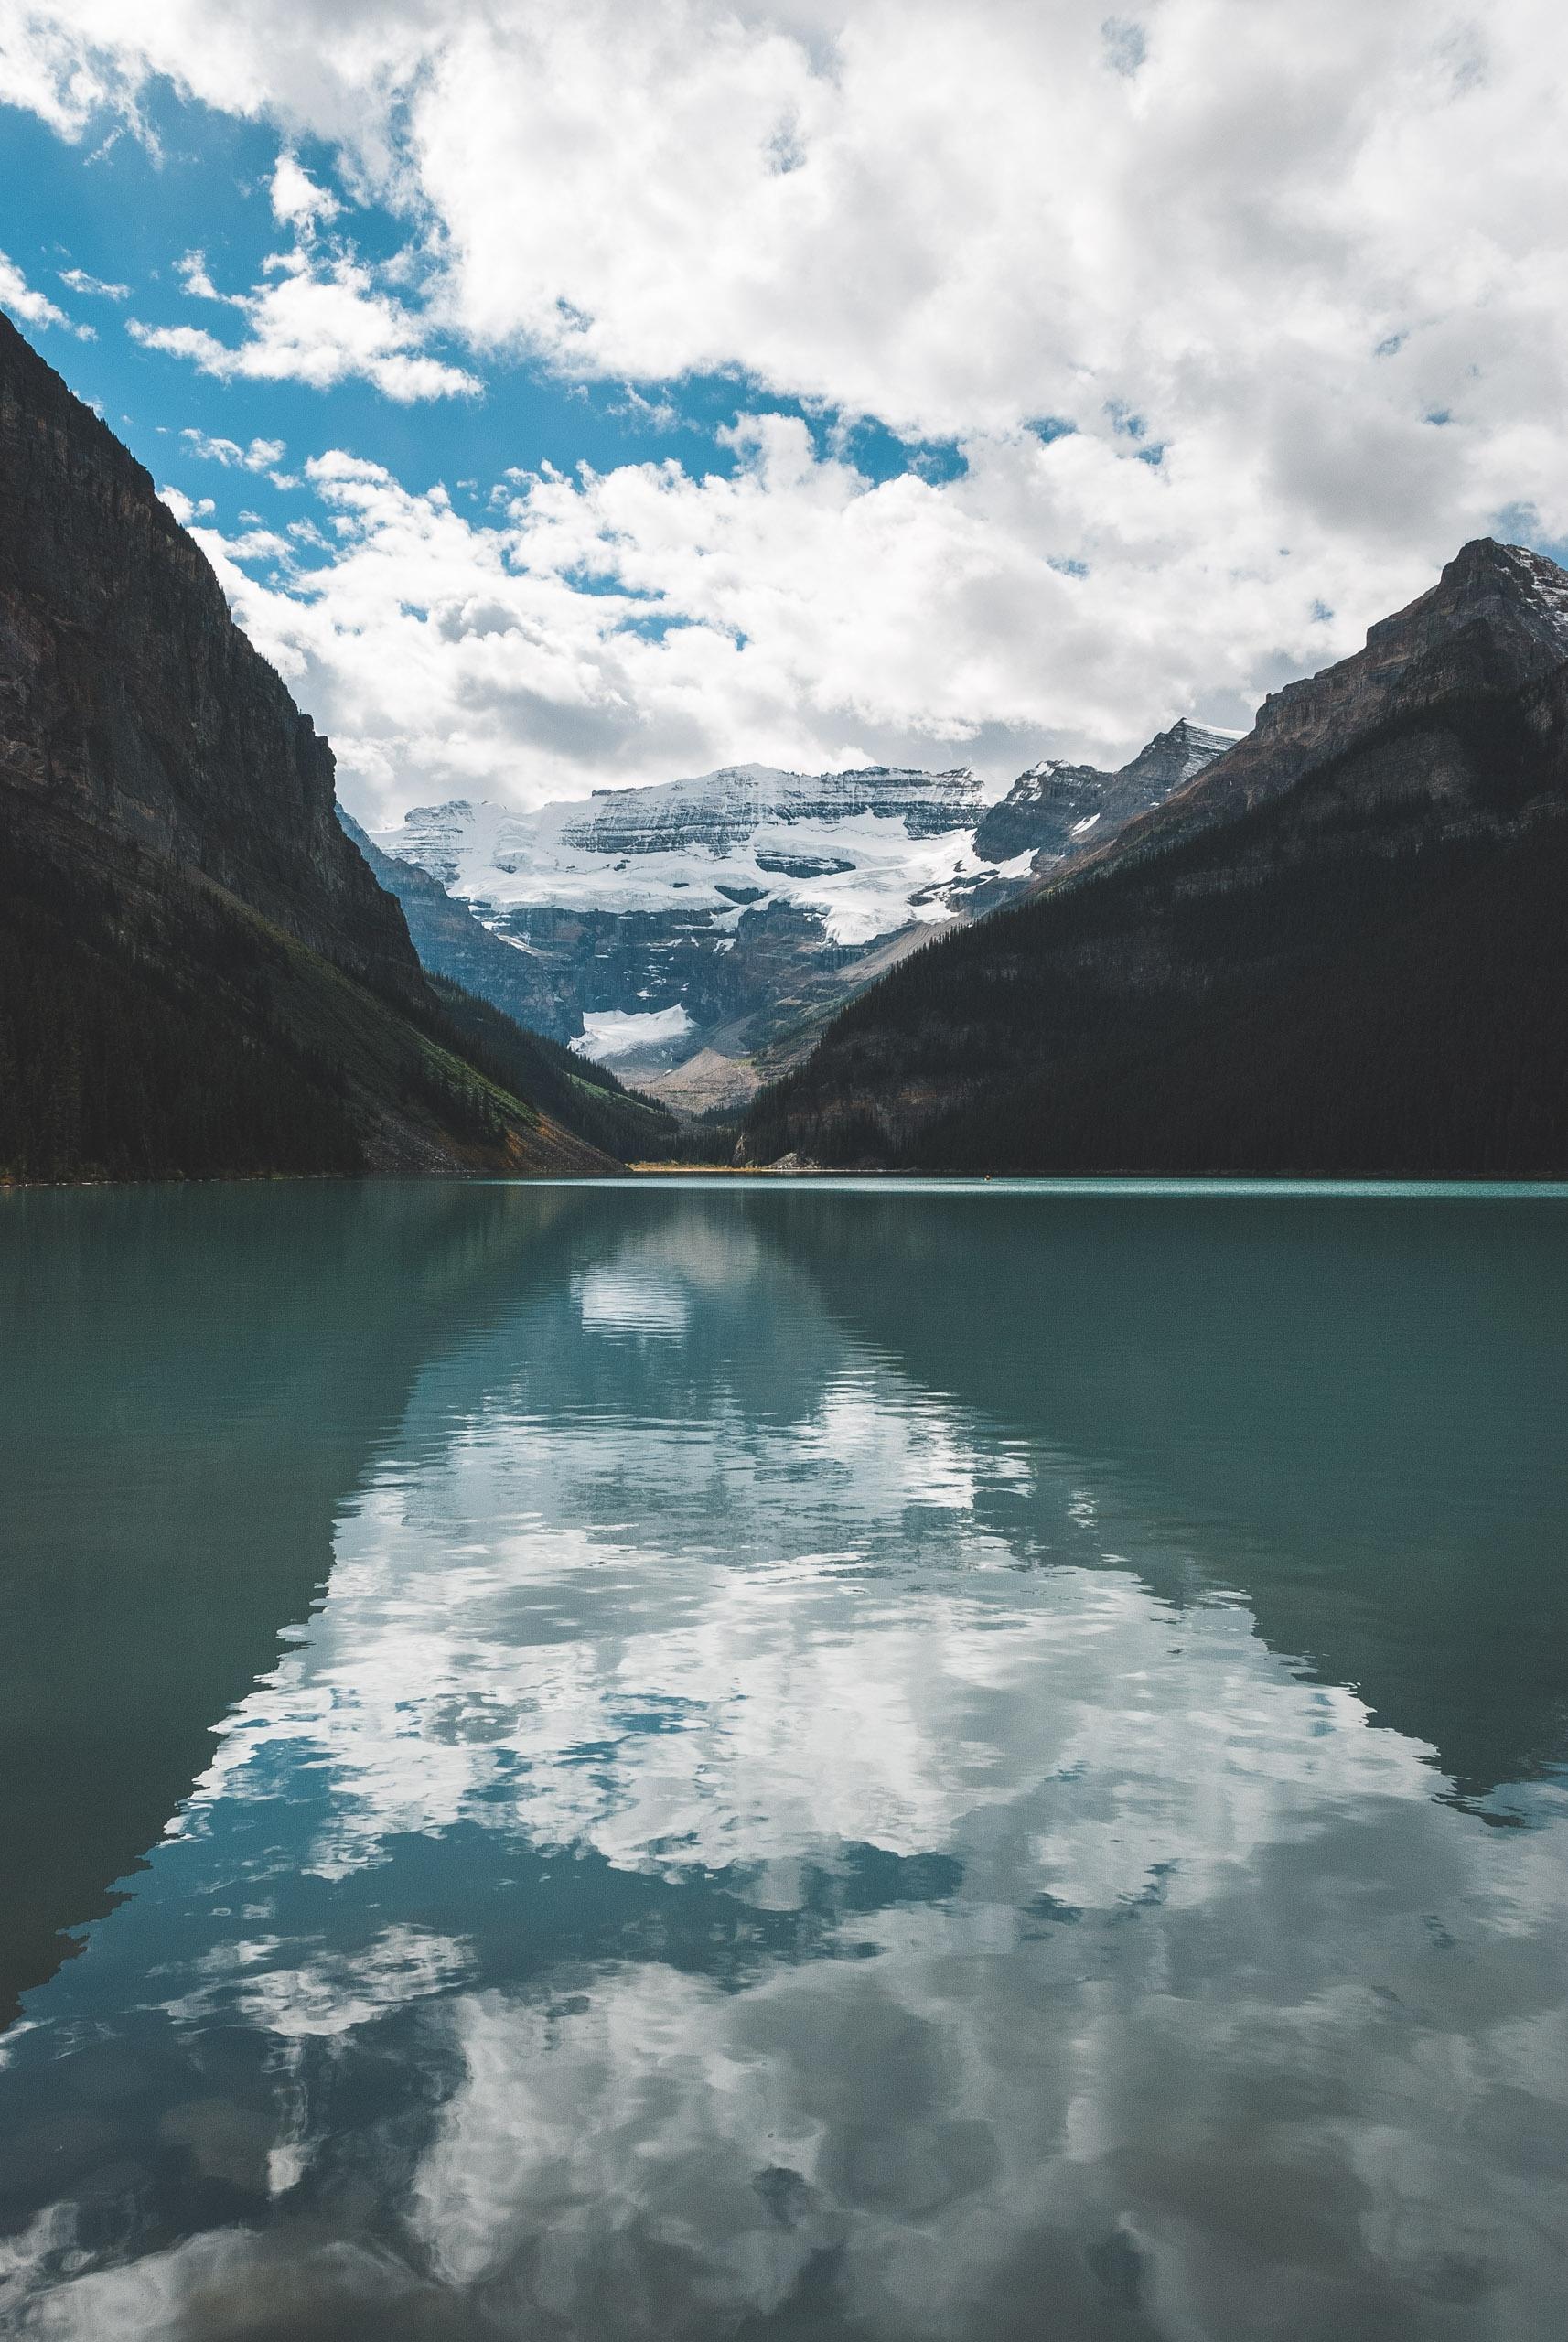 Banff National Park - 2007-0908-DSC_0057_58162